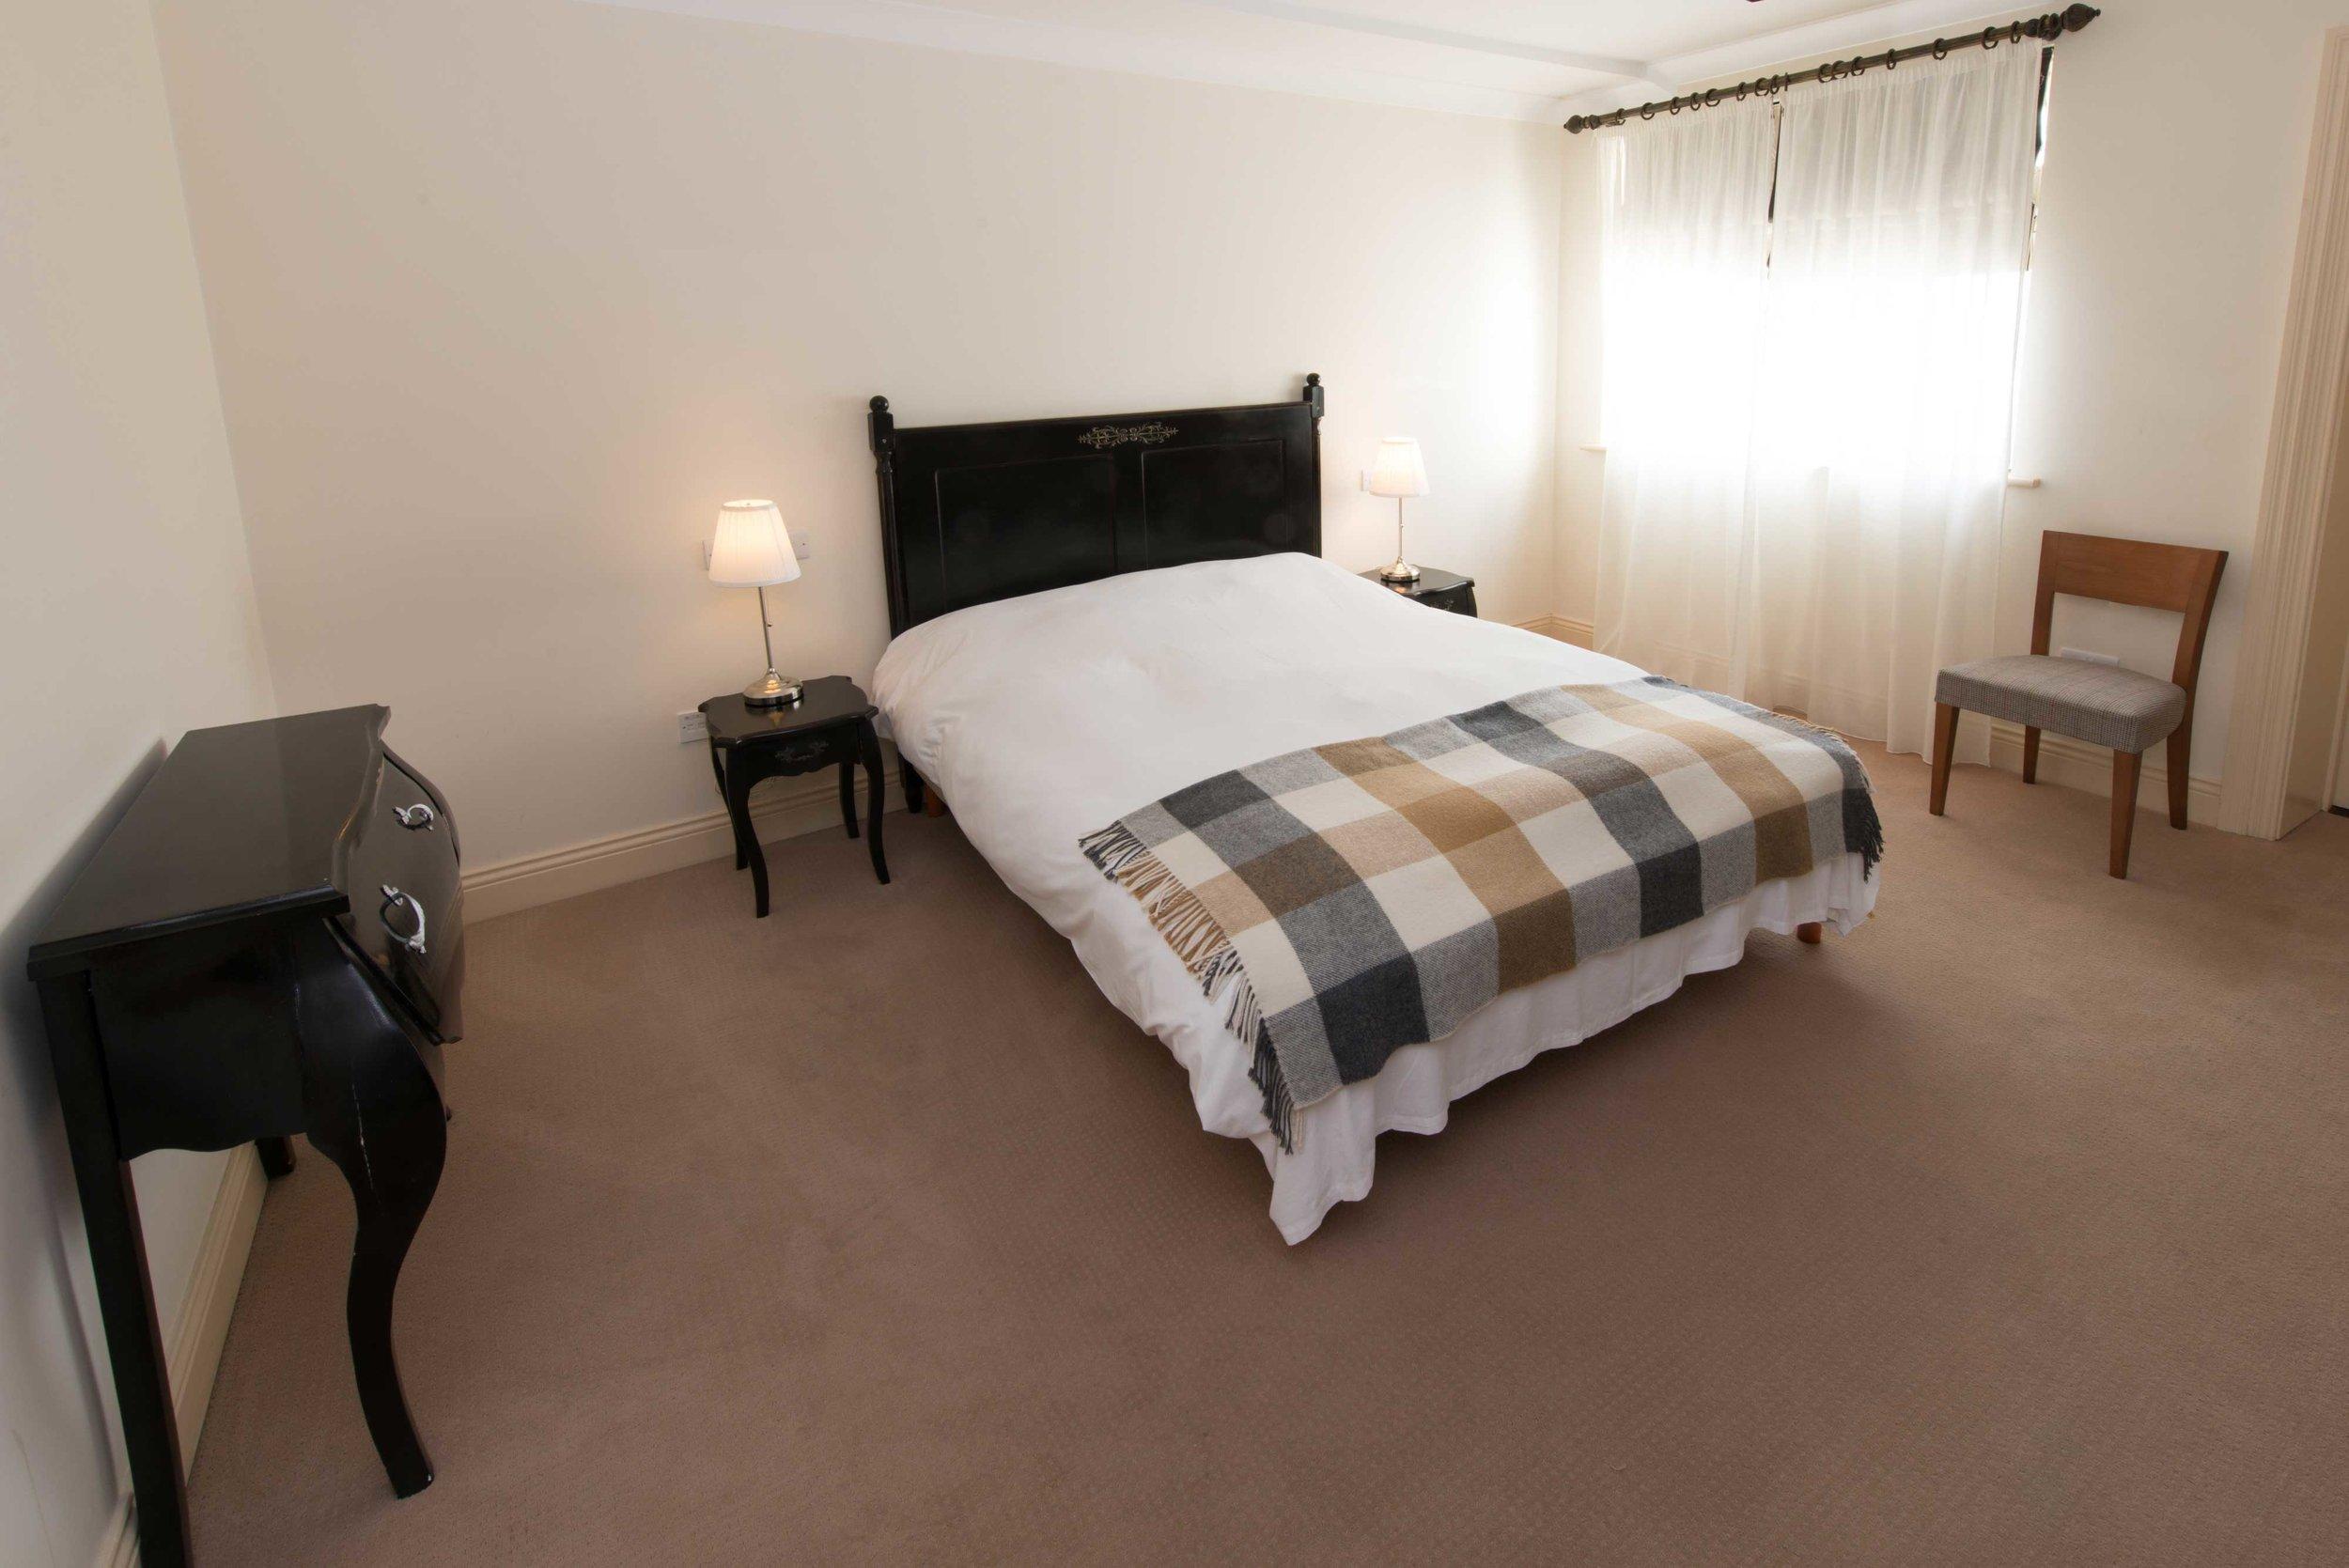 Connemara Lake Hotel - Double Room